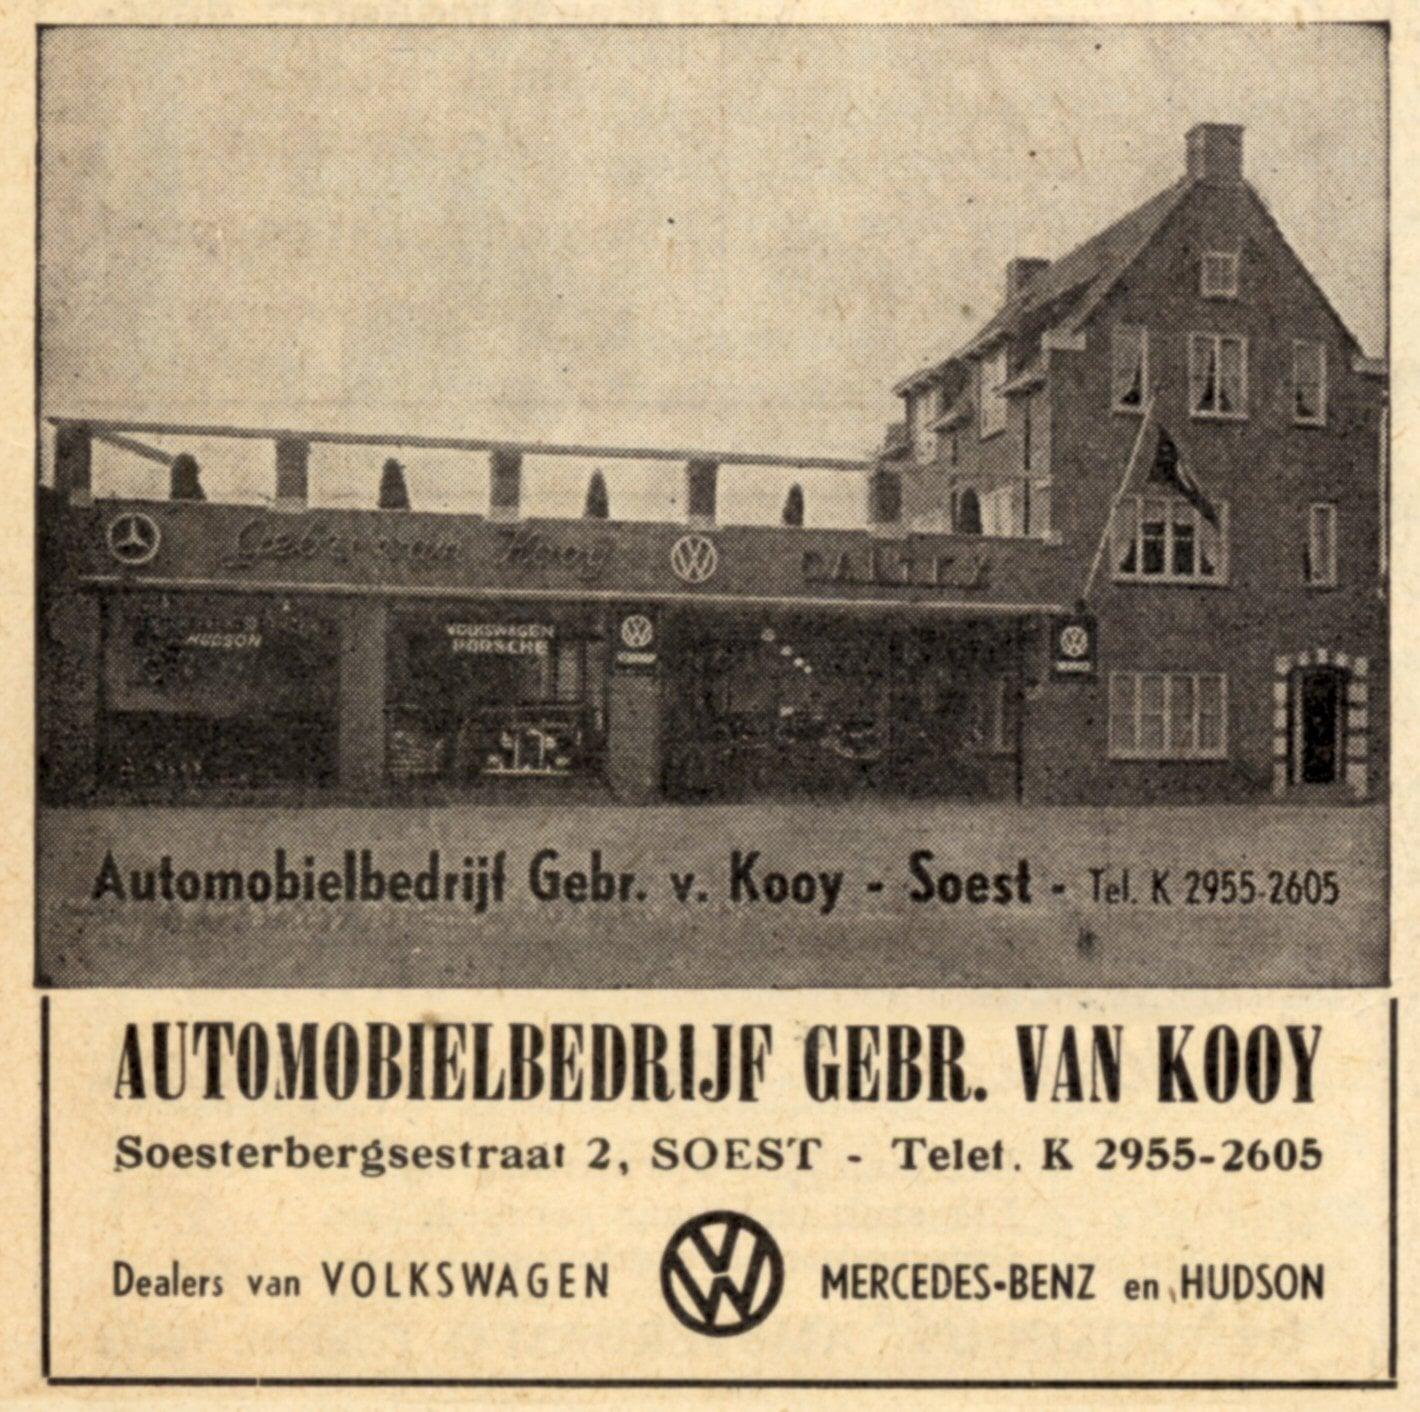 VW-garage-1952-van-de-Gebr-van-Kooy-te-Soest